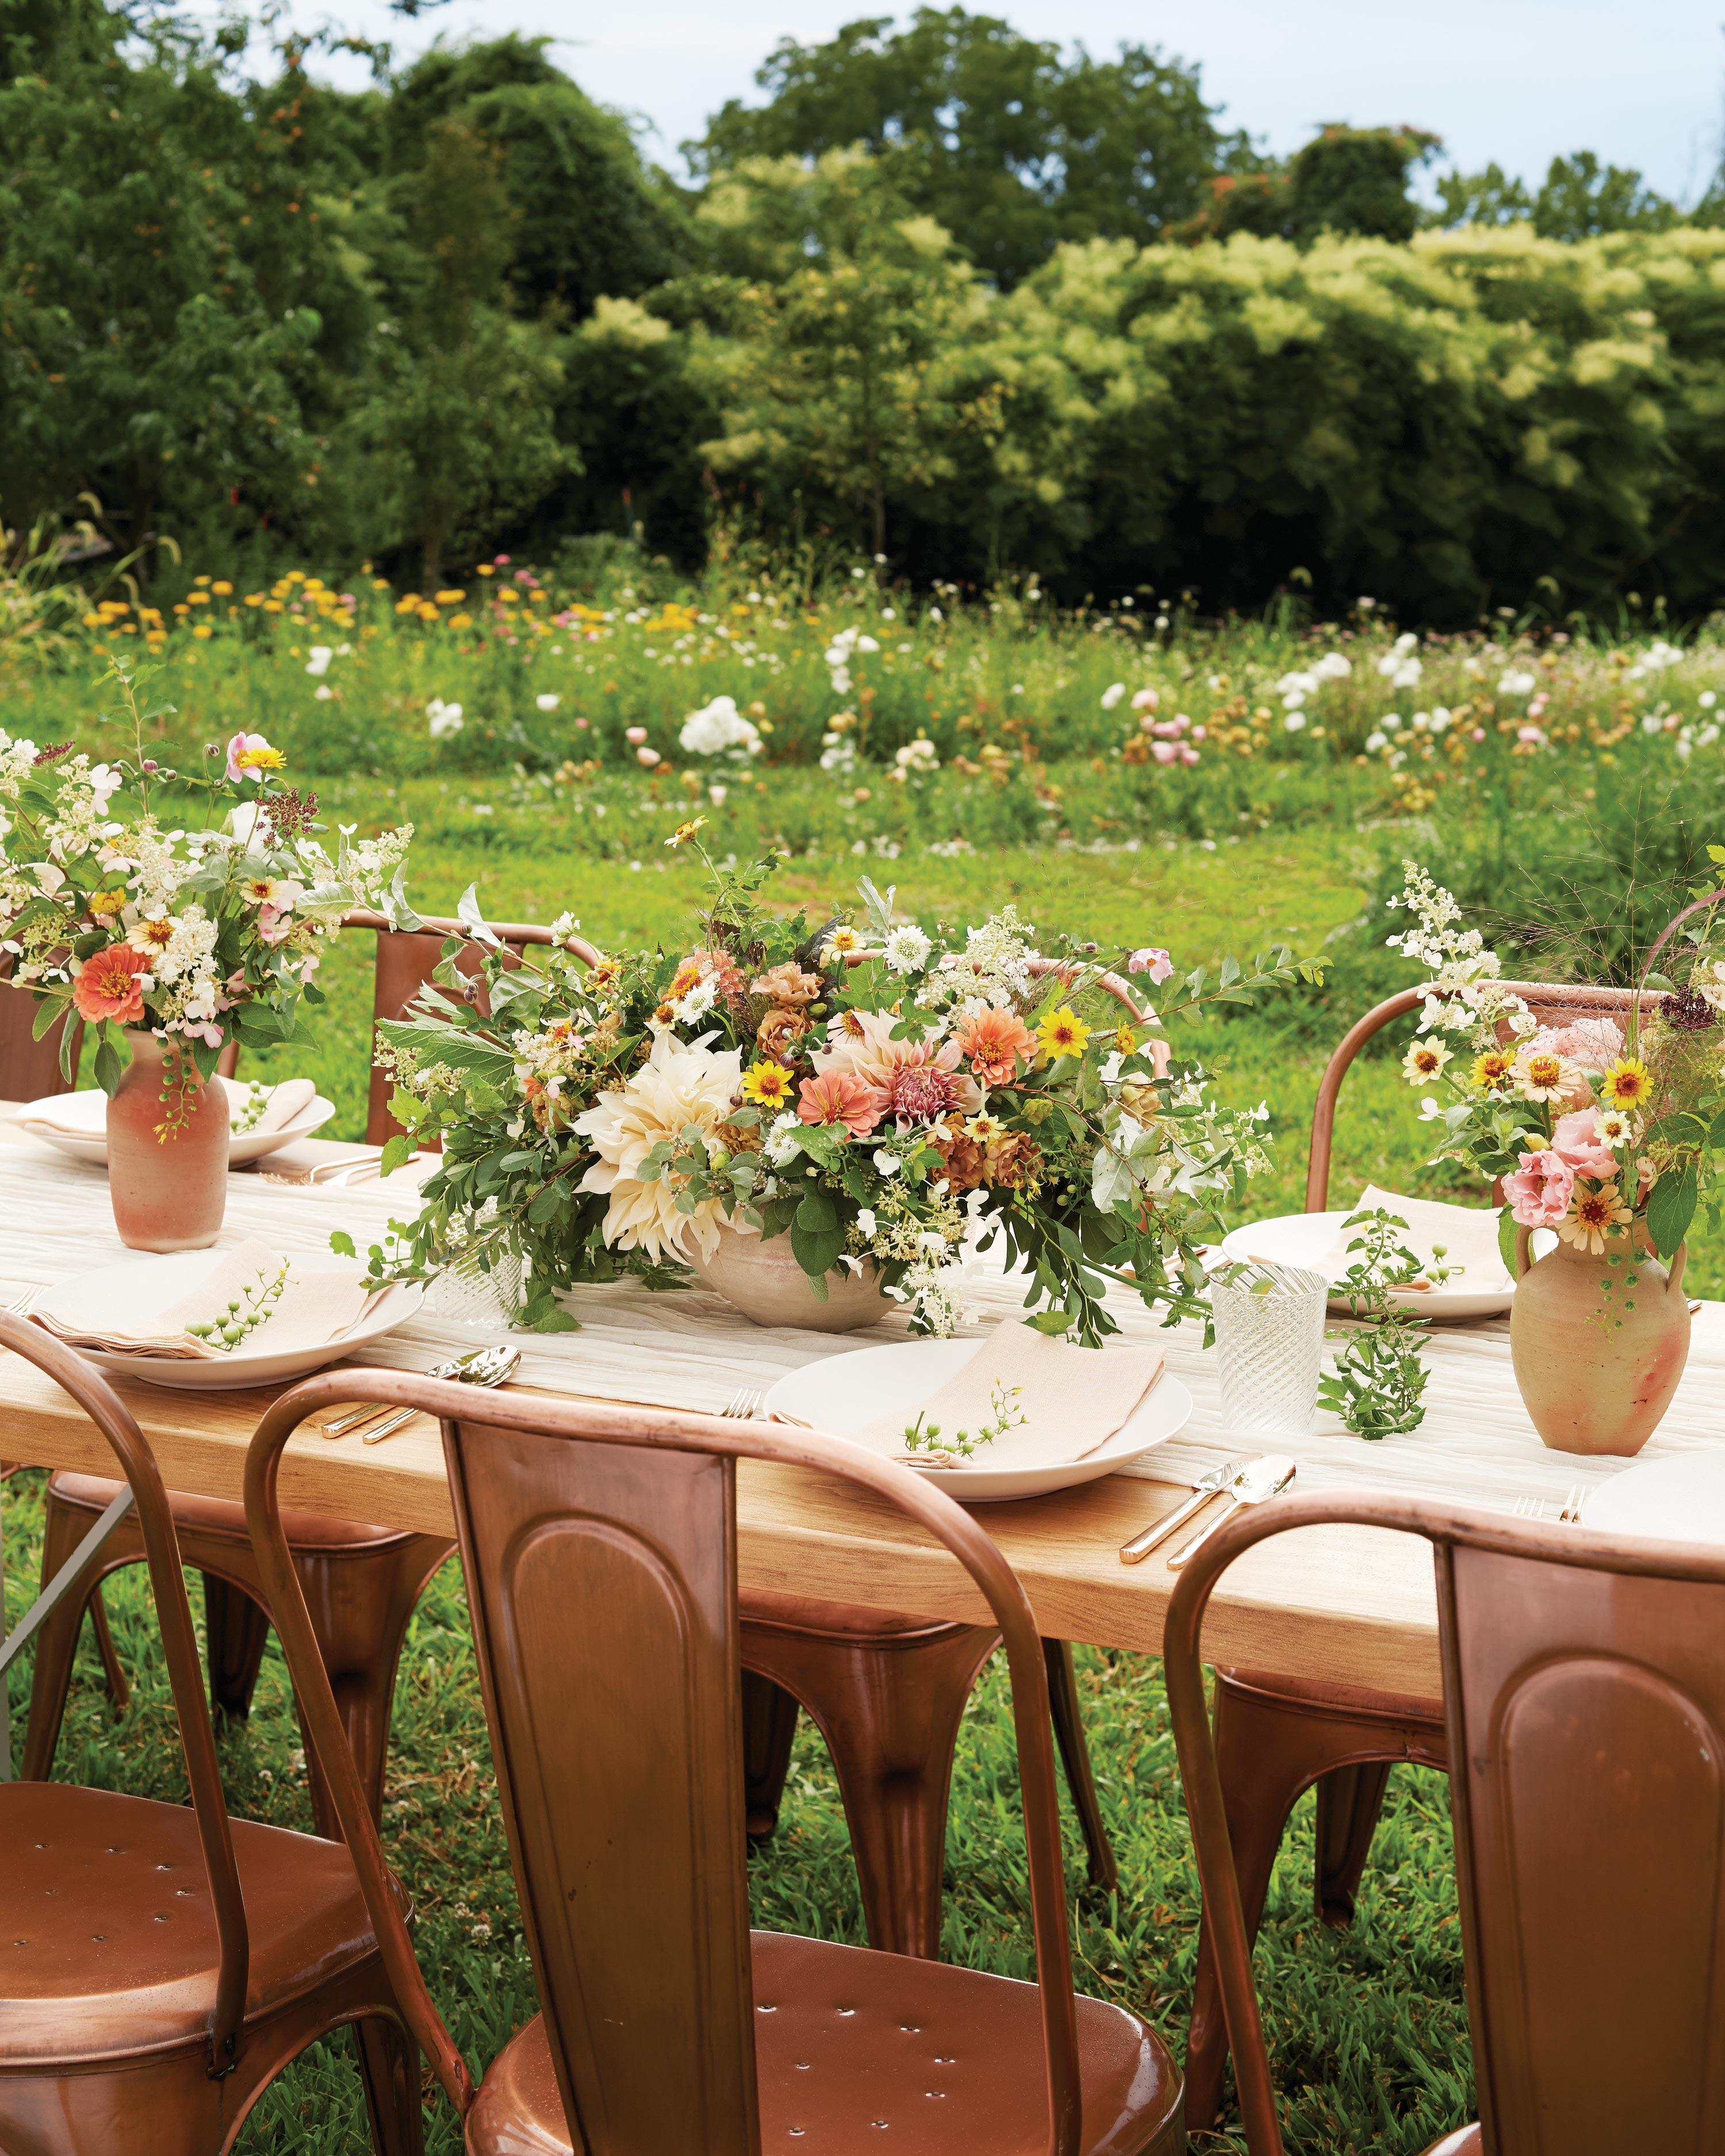 jennie-love-flowers-table-01-d112402.jpg